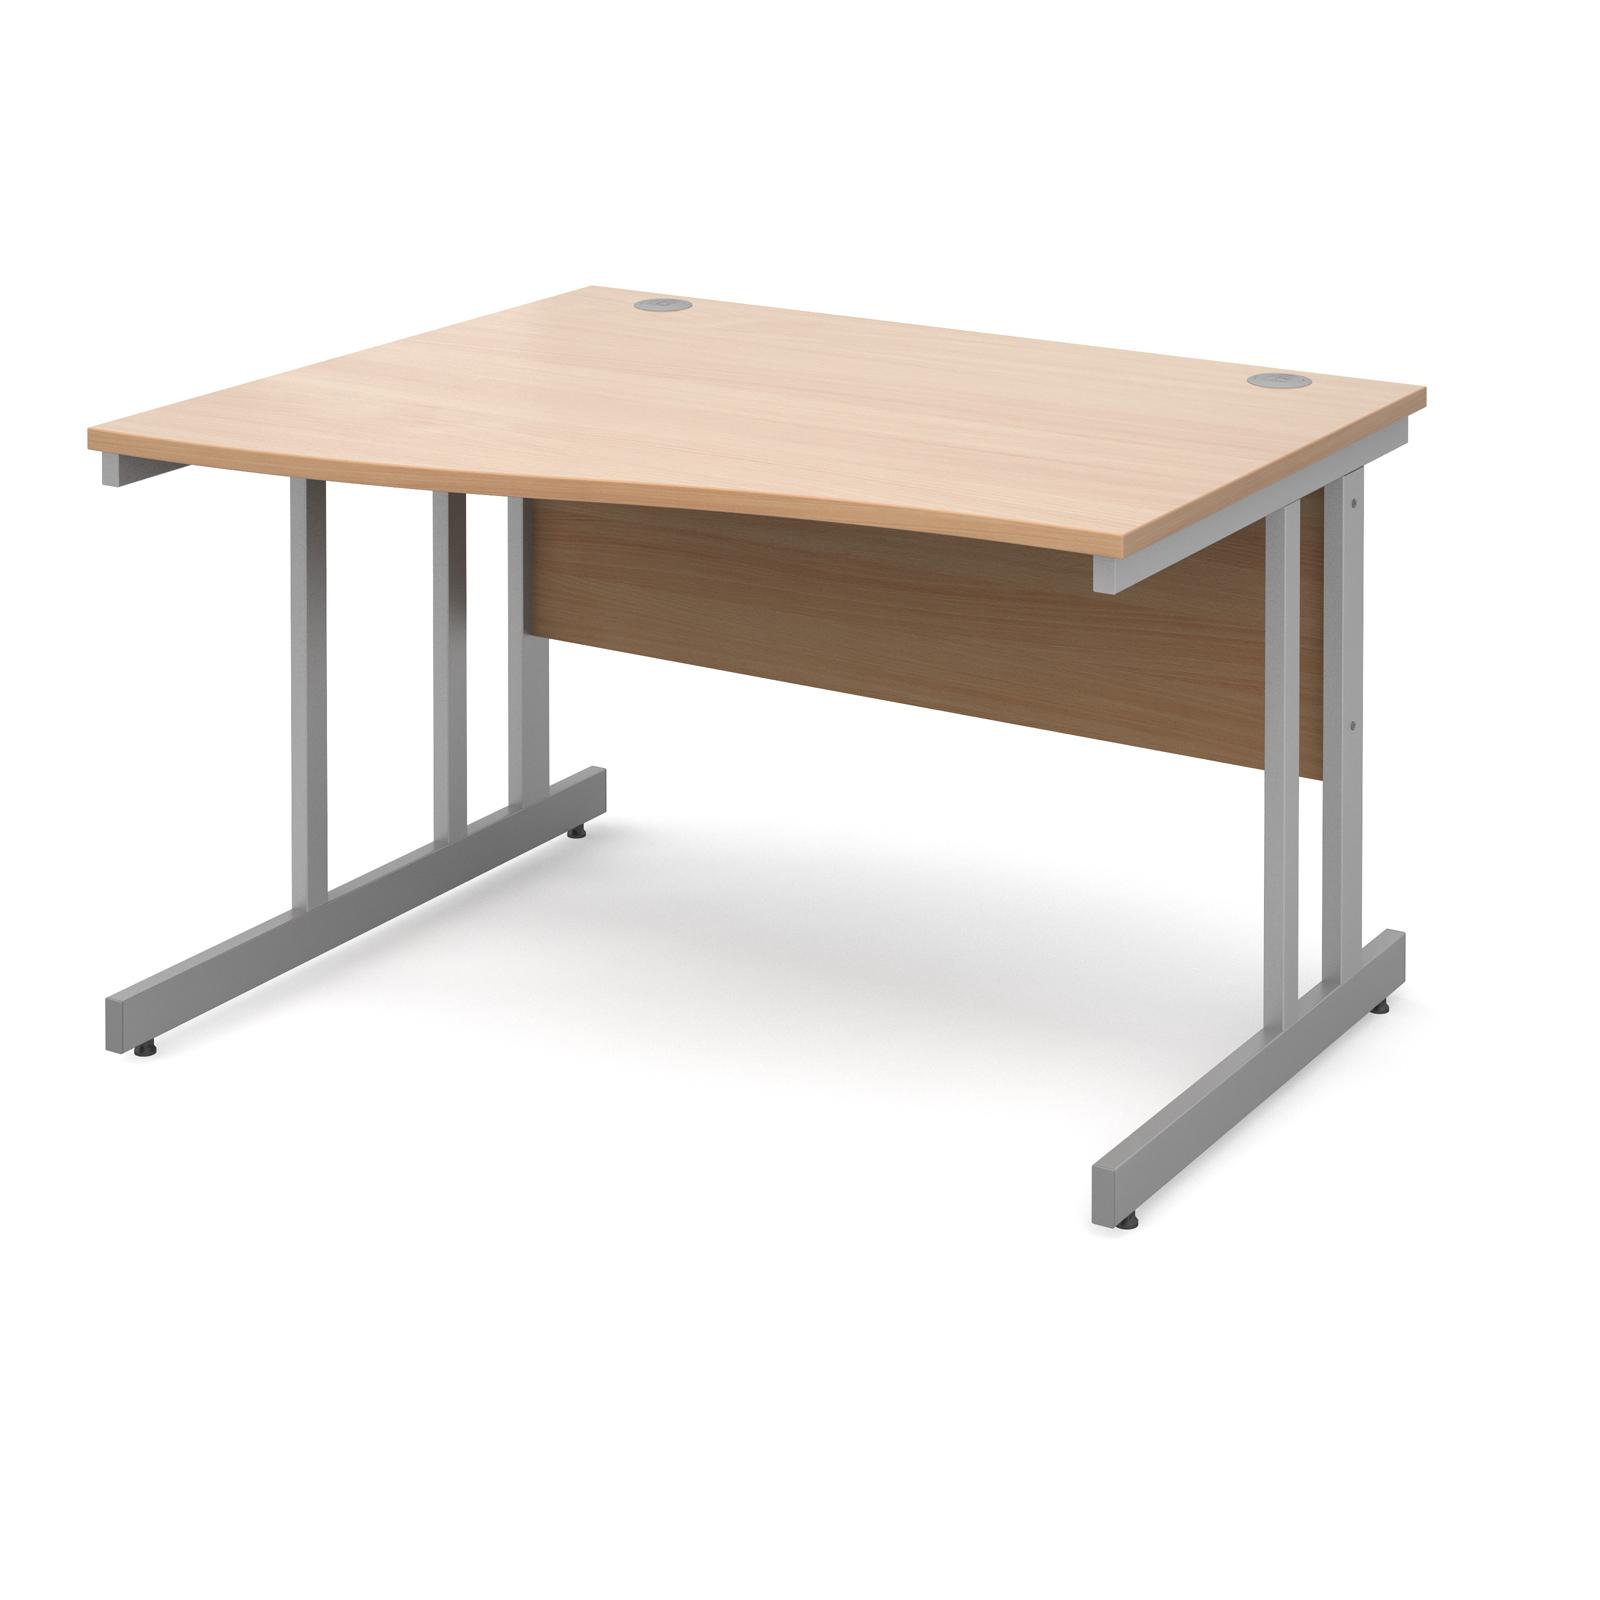 Momento left hand wave desk 1200mm - silver cantilever frame, beech top